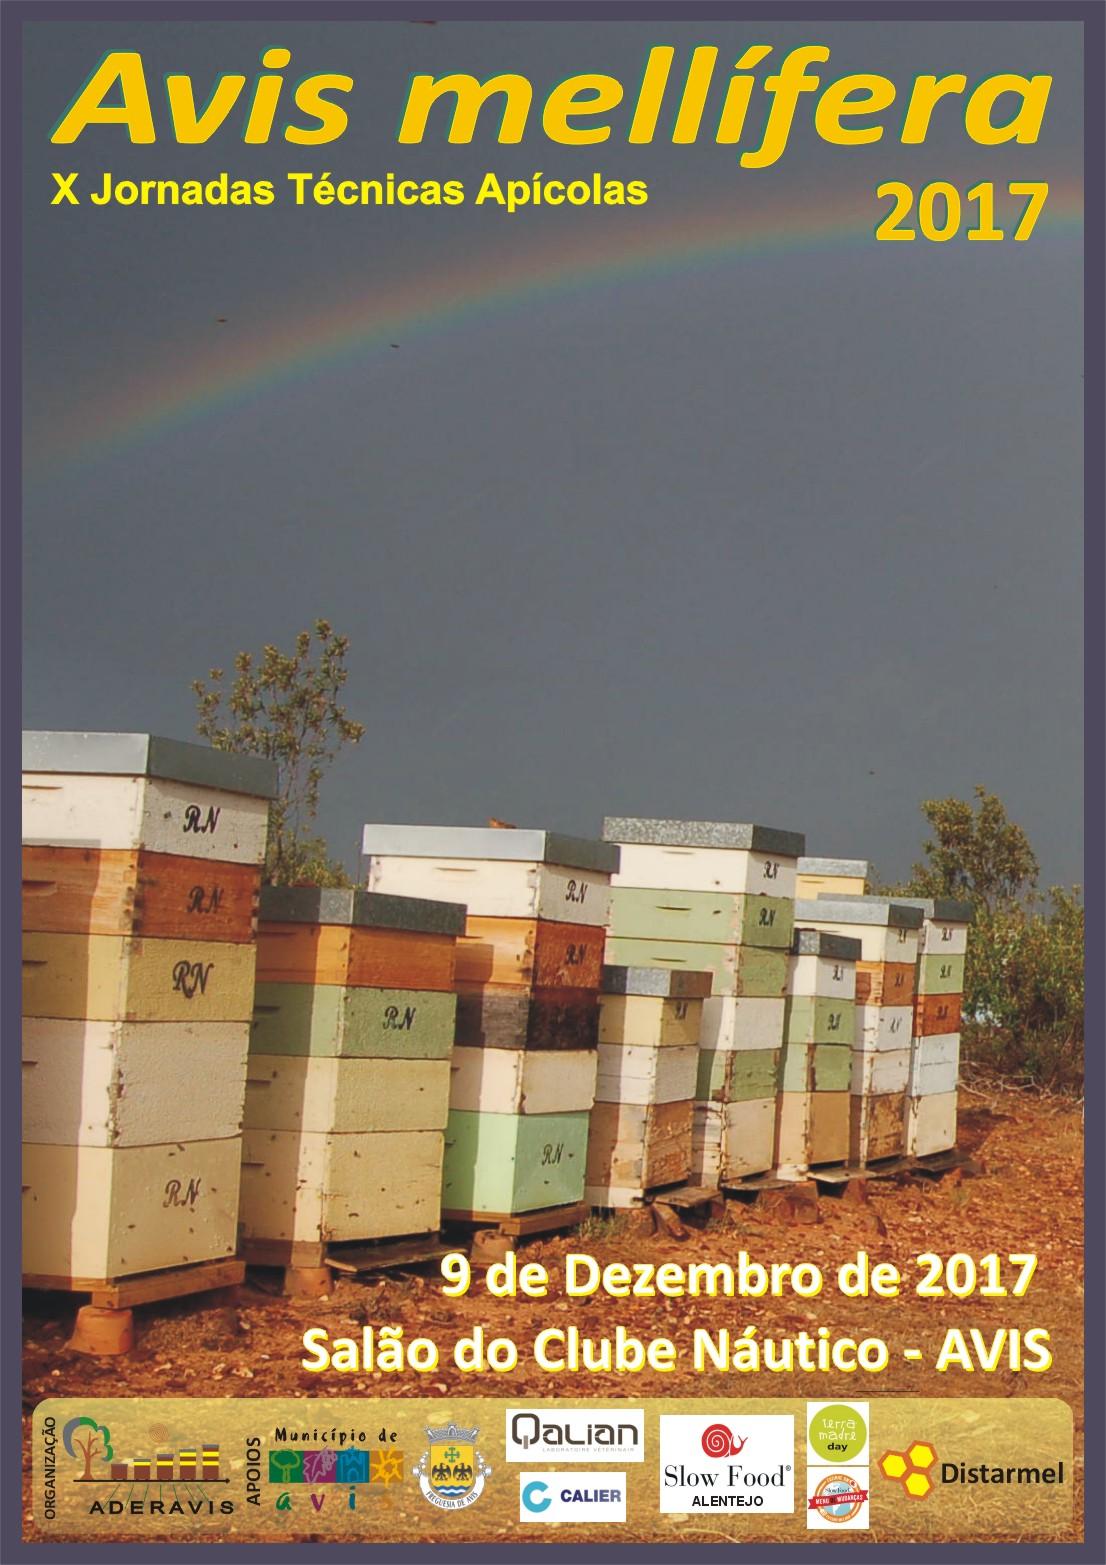 Avis mellifera 2017